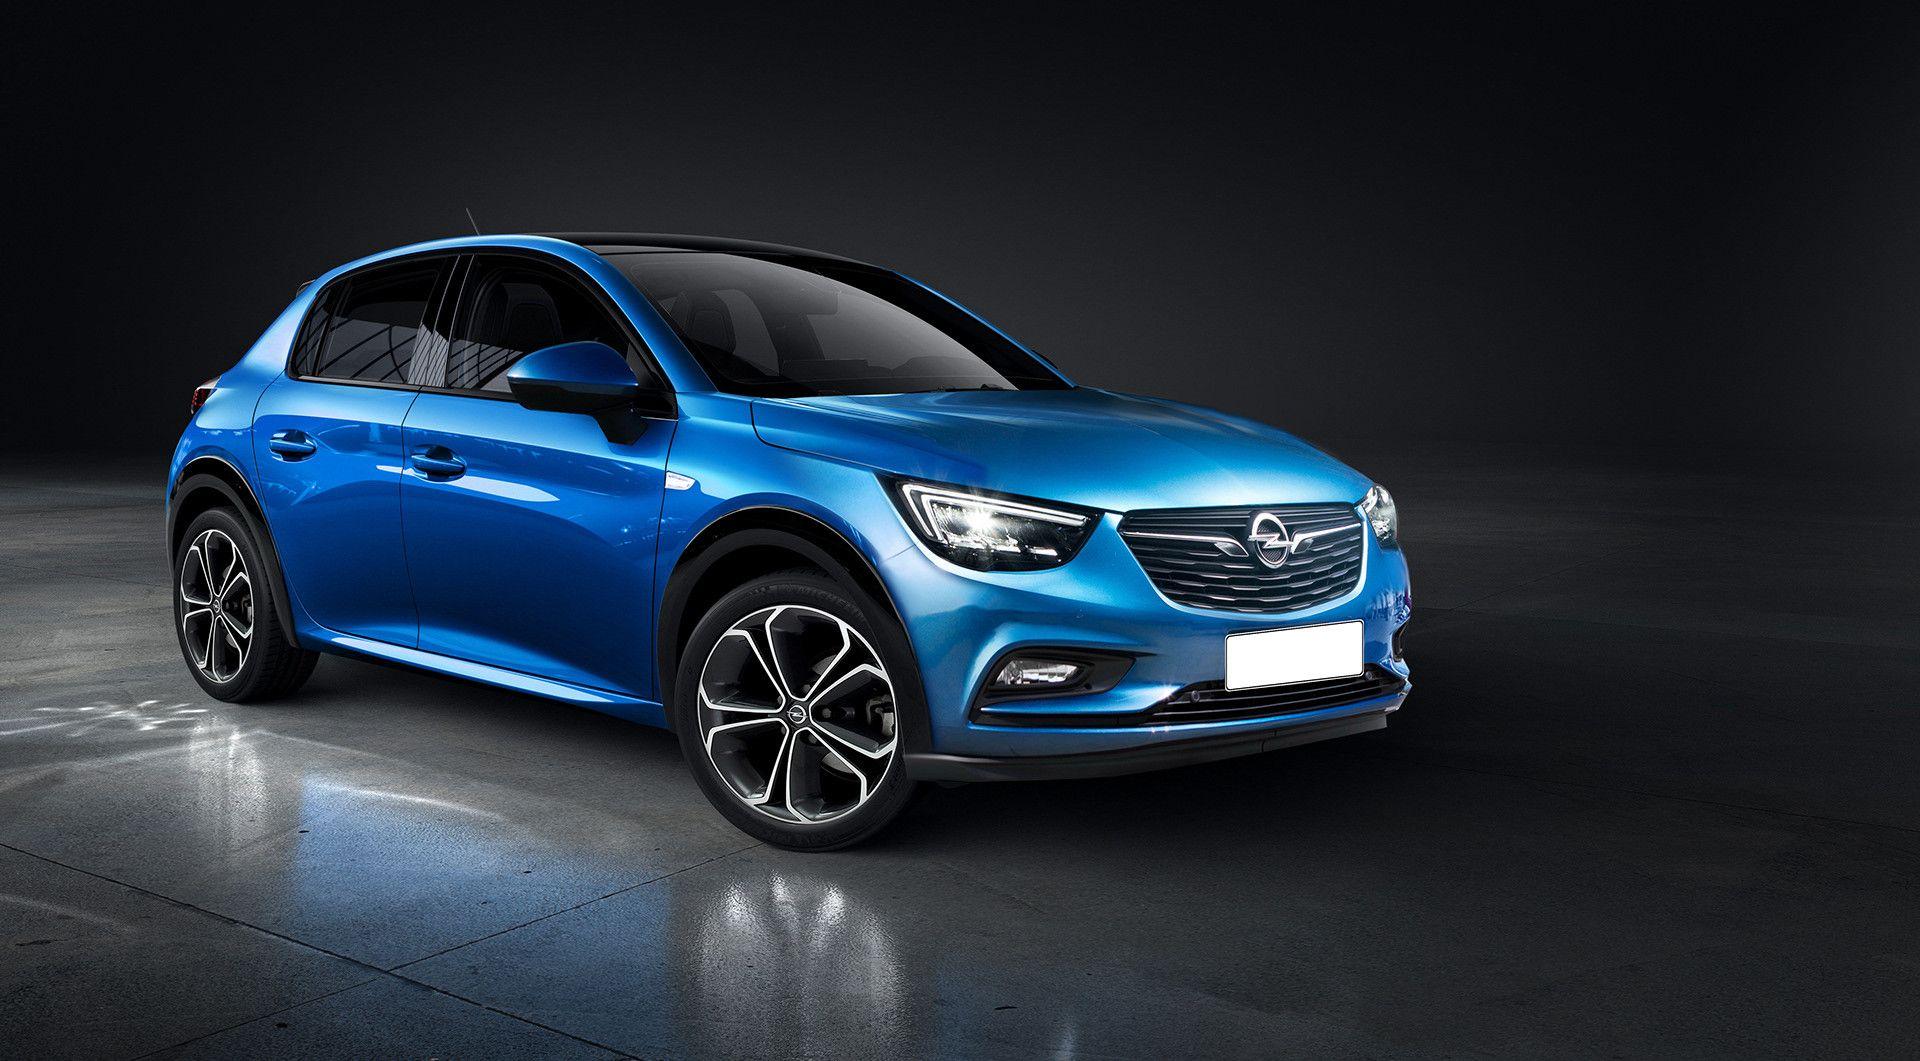 Opel Corsa 2020 Rendering Price and Release DateCar Update